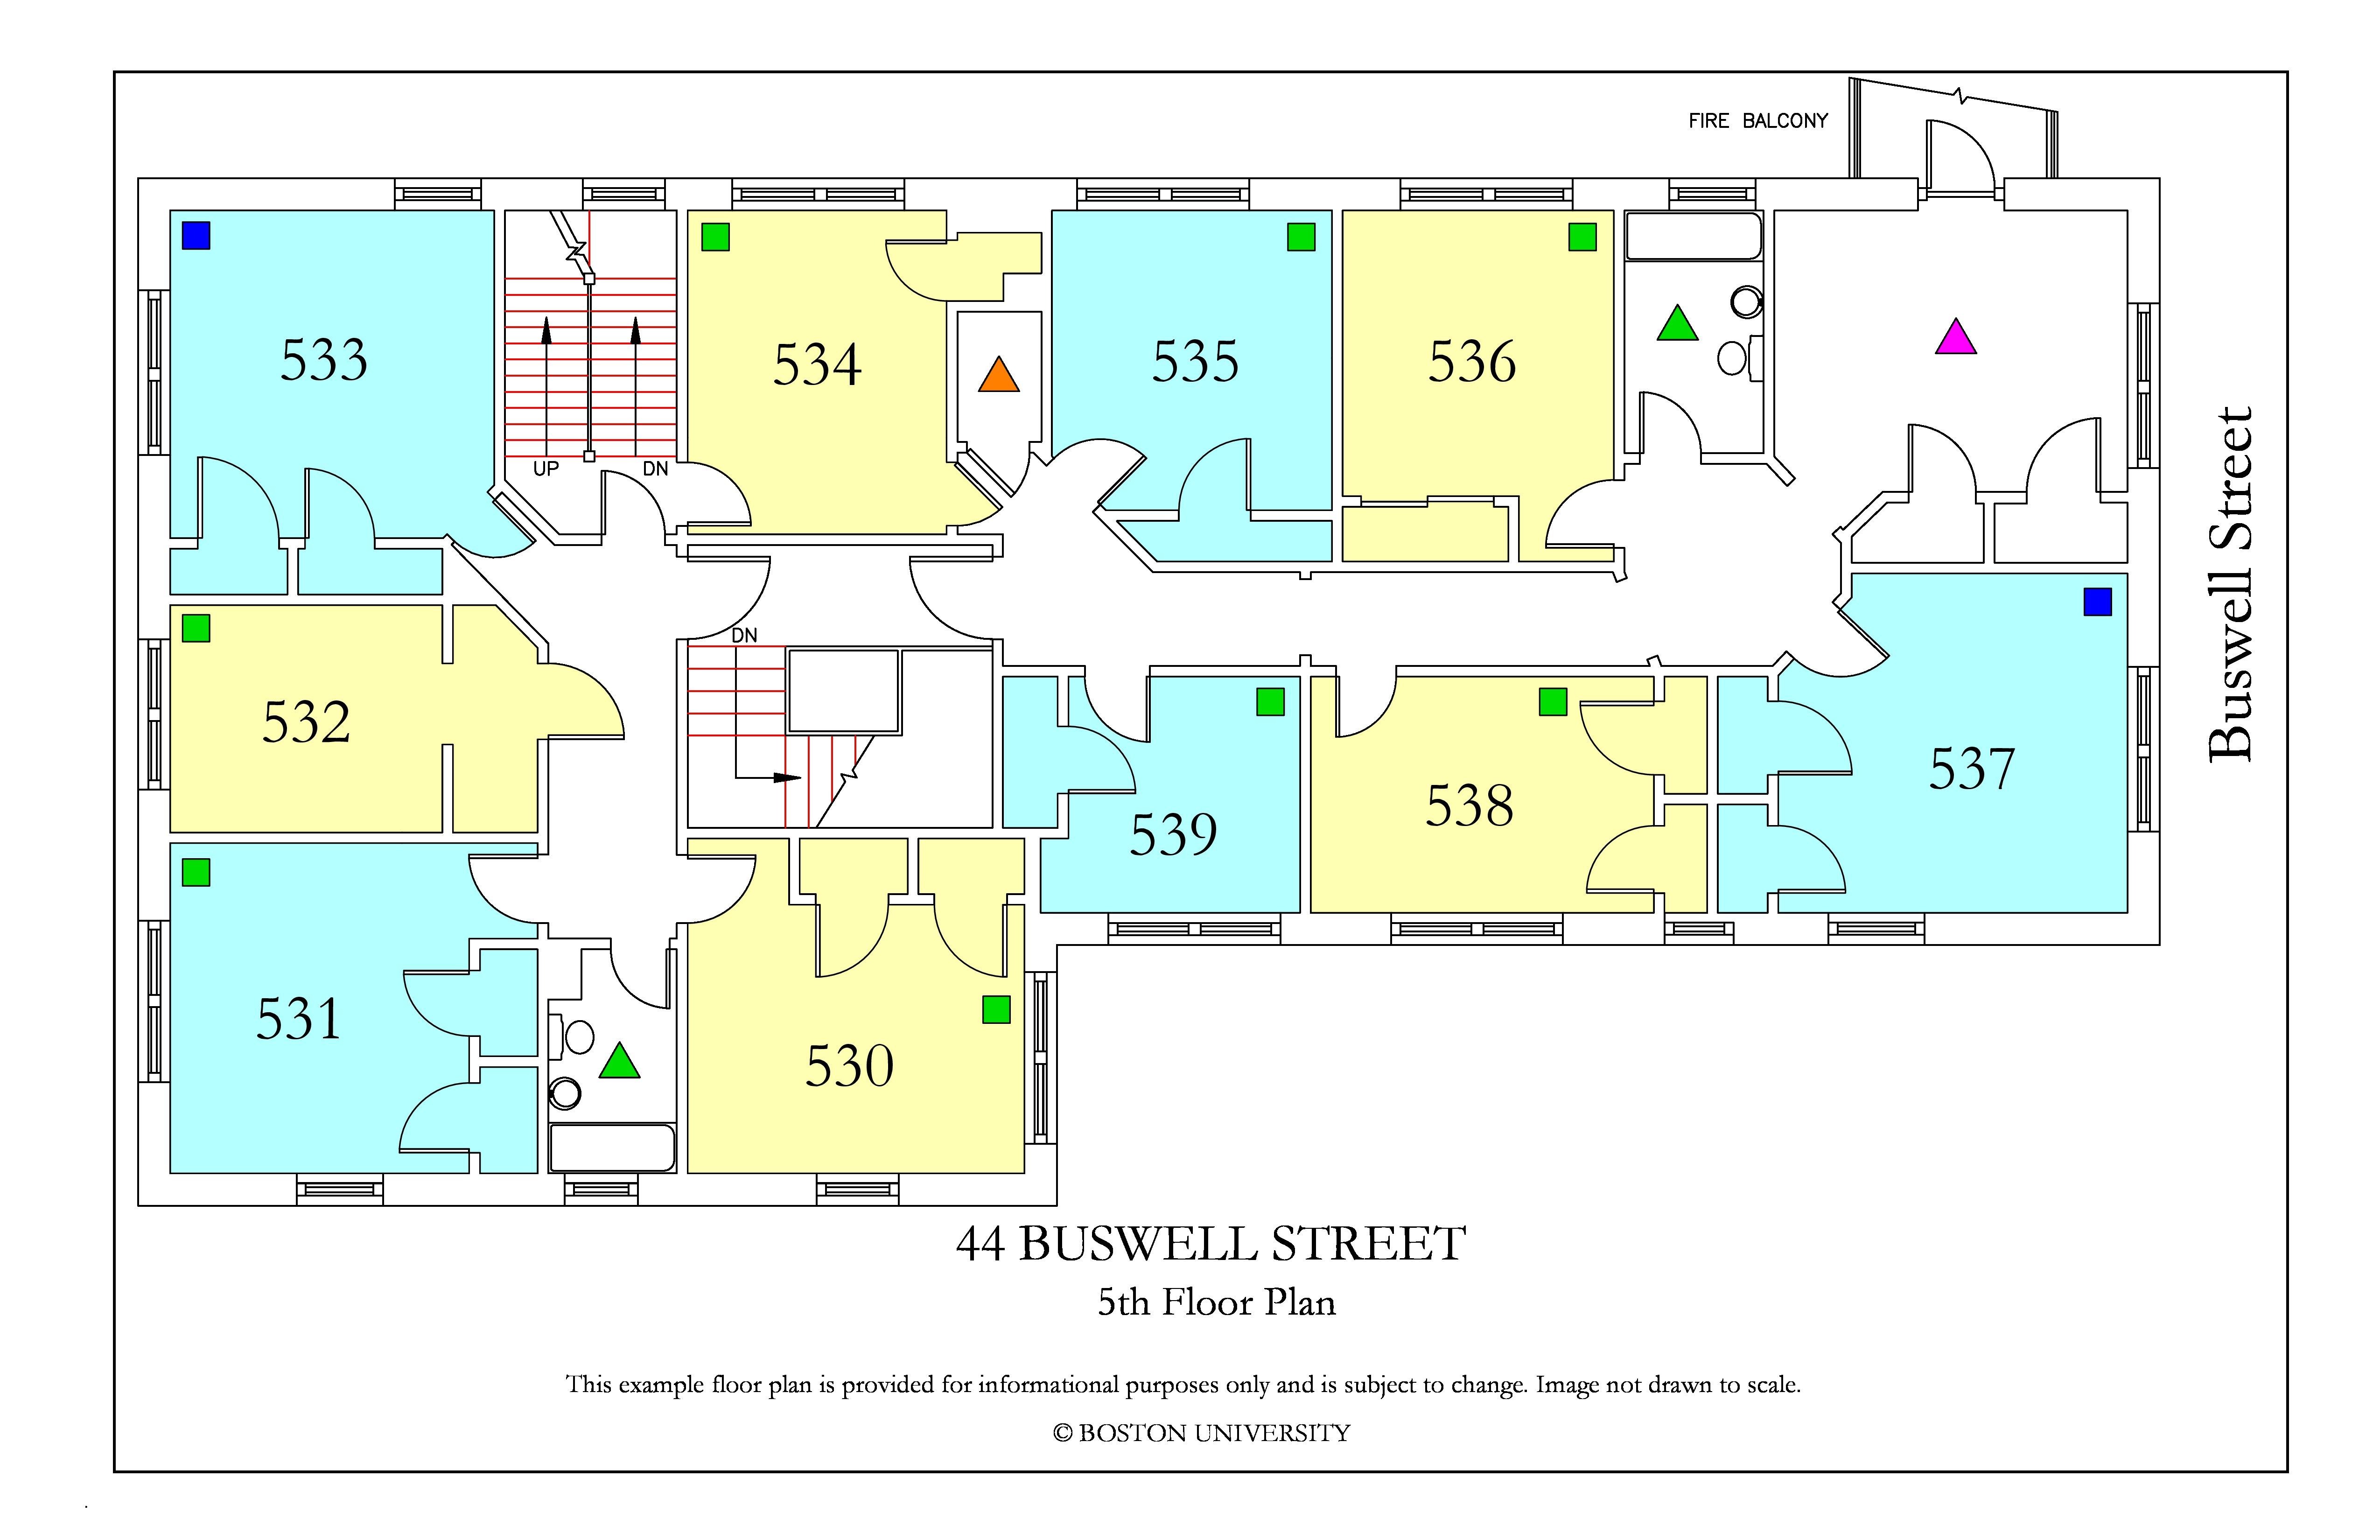 44 Buswell Street Housing